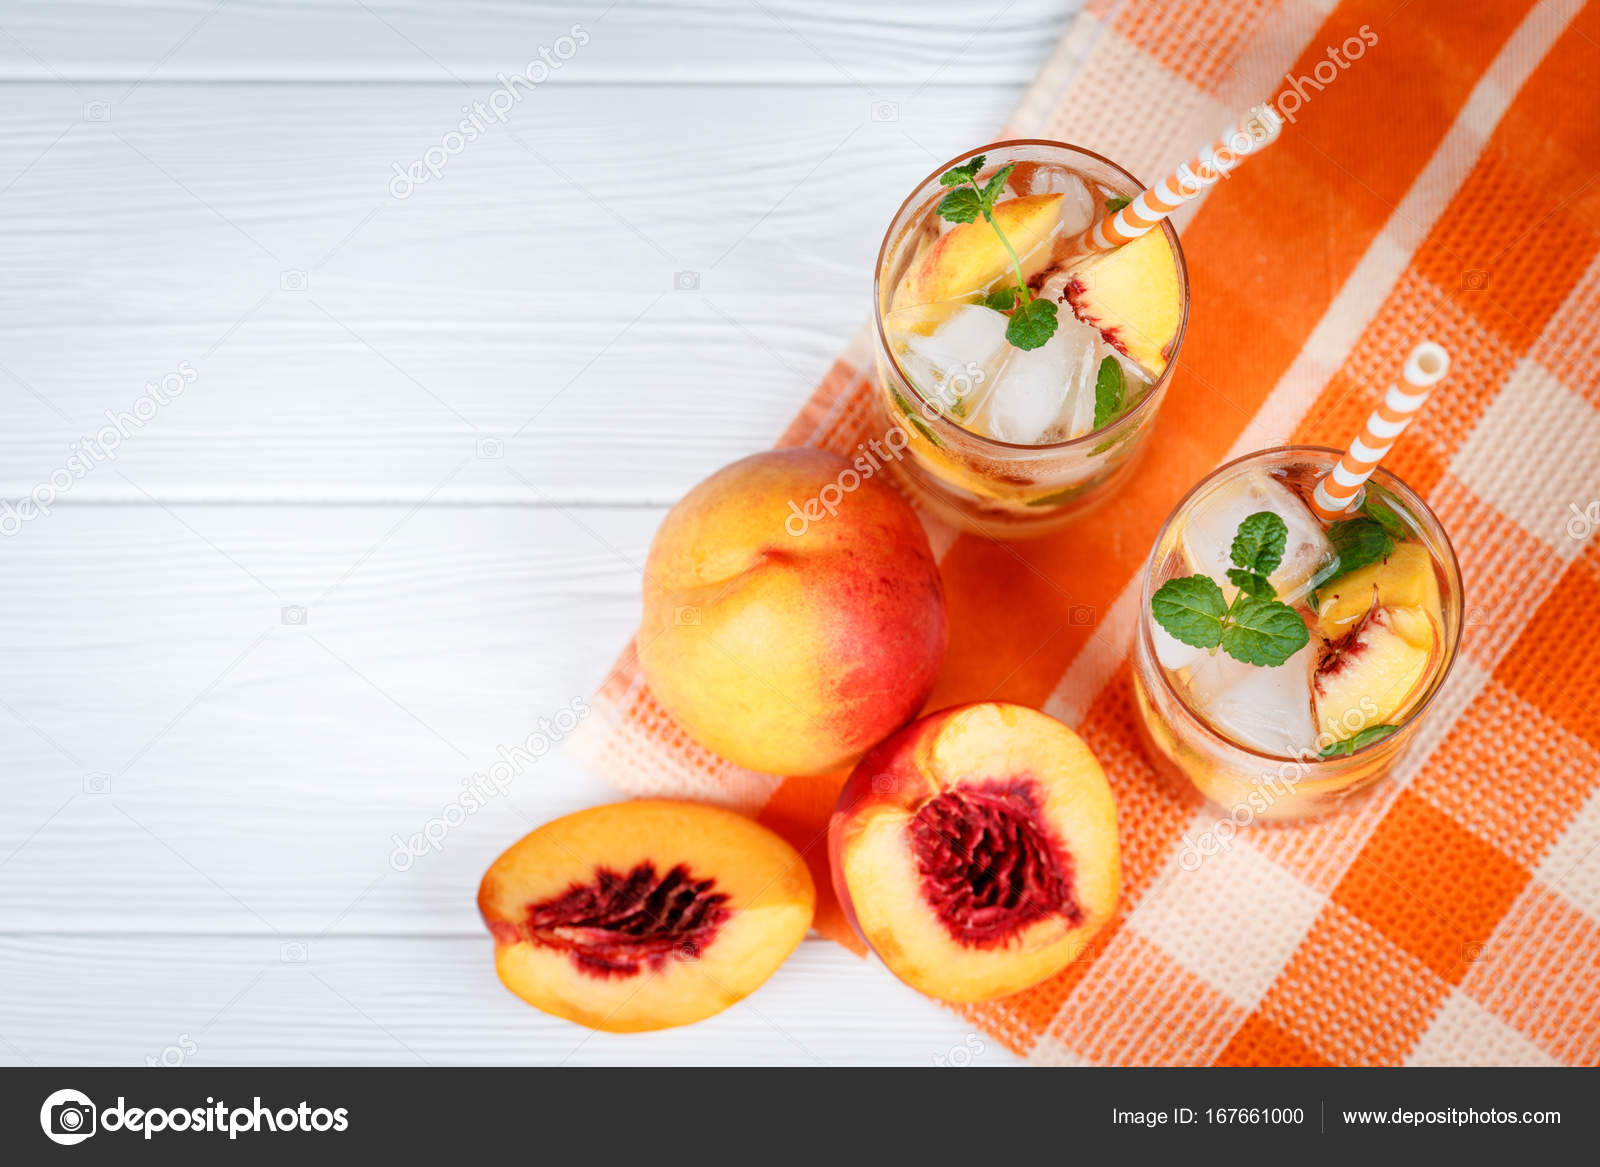 peach lemonade with ice and mint leaves homemade lemonade of ripe